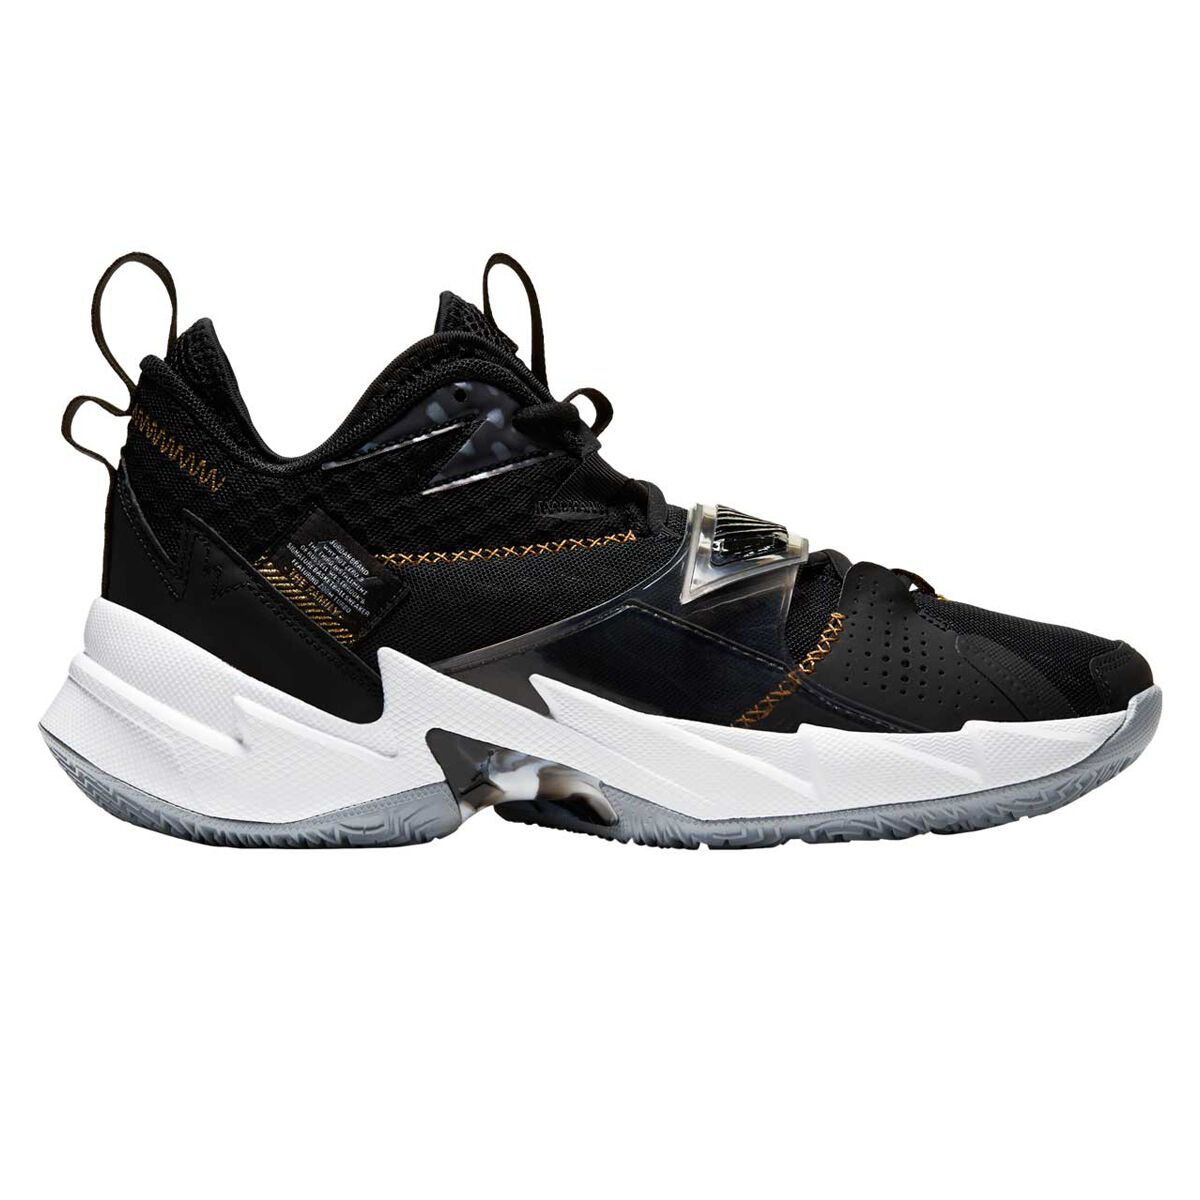 Nike Air Max Thea Spor Ayakkabı Ucuz